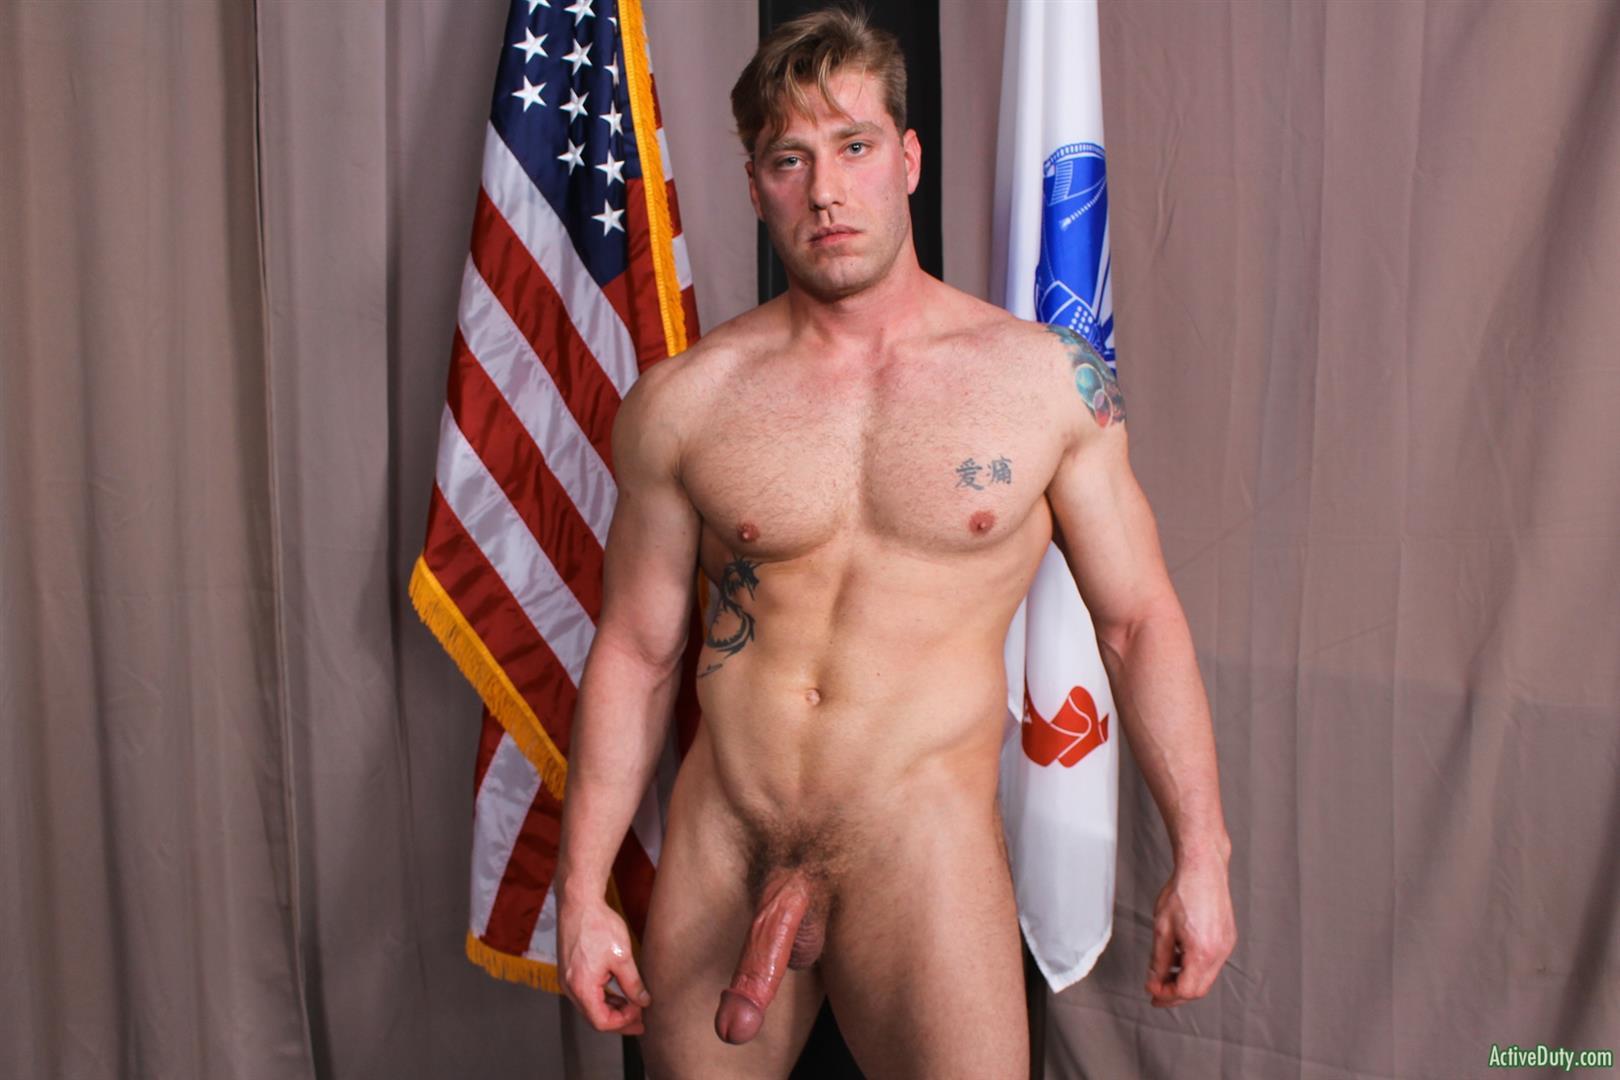 Active-Duty-John-Hawkins-Muscular-Air-Force-Guy-Big-Cock-Jerk-Off-Video-11 US Air Force Airman Strokes His Big Hard Cock